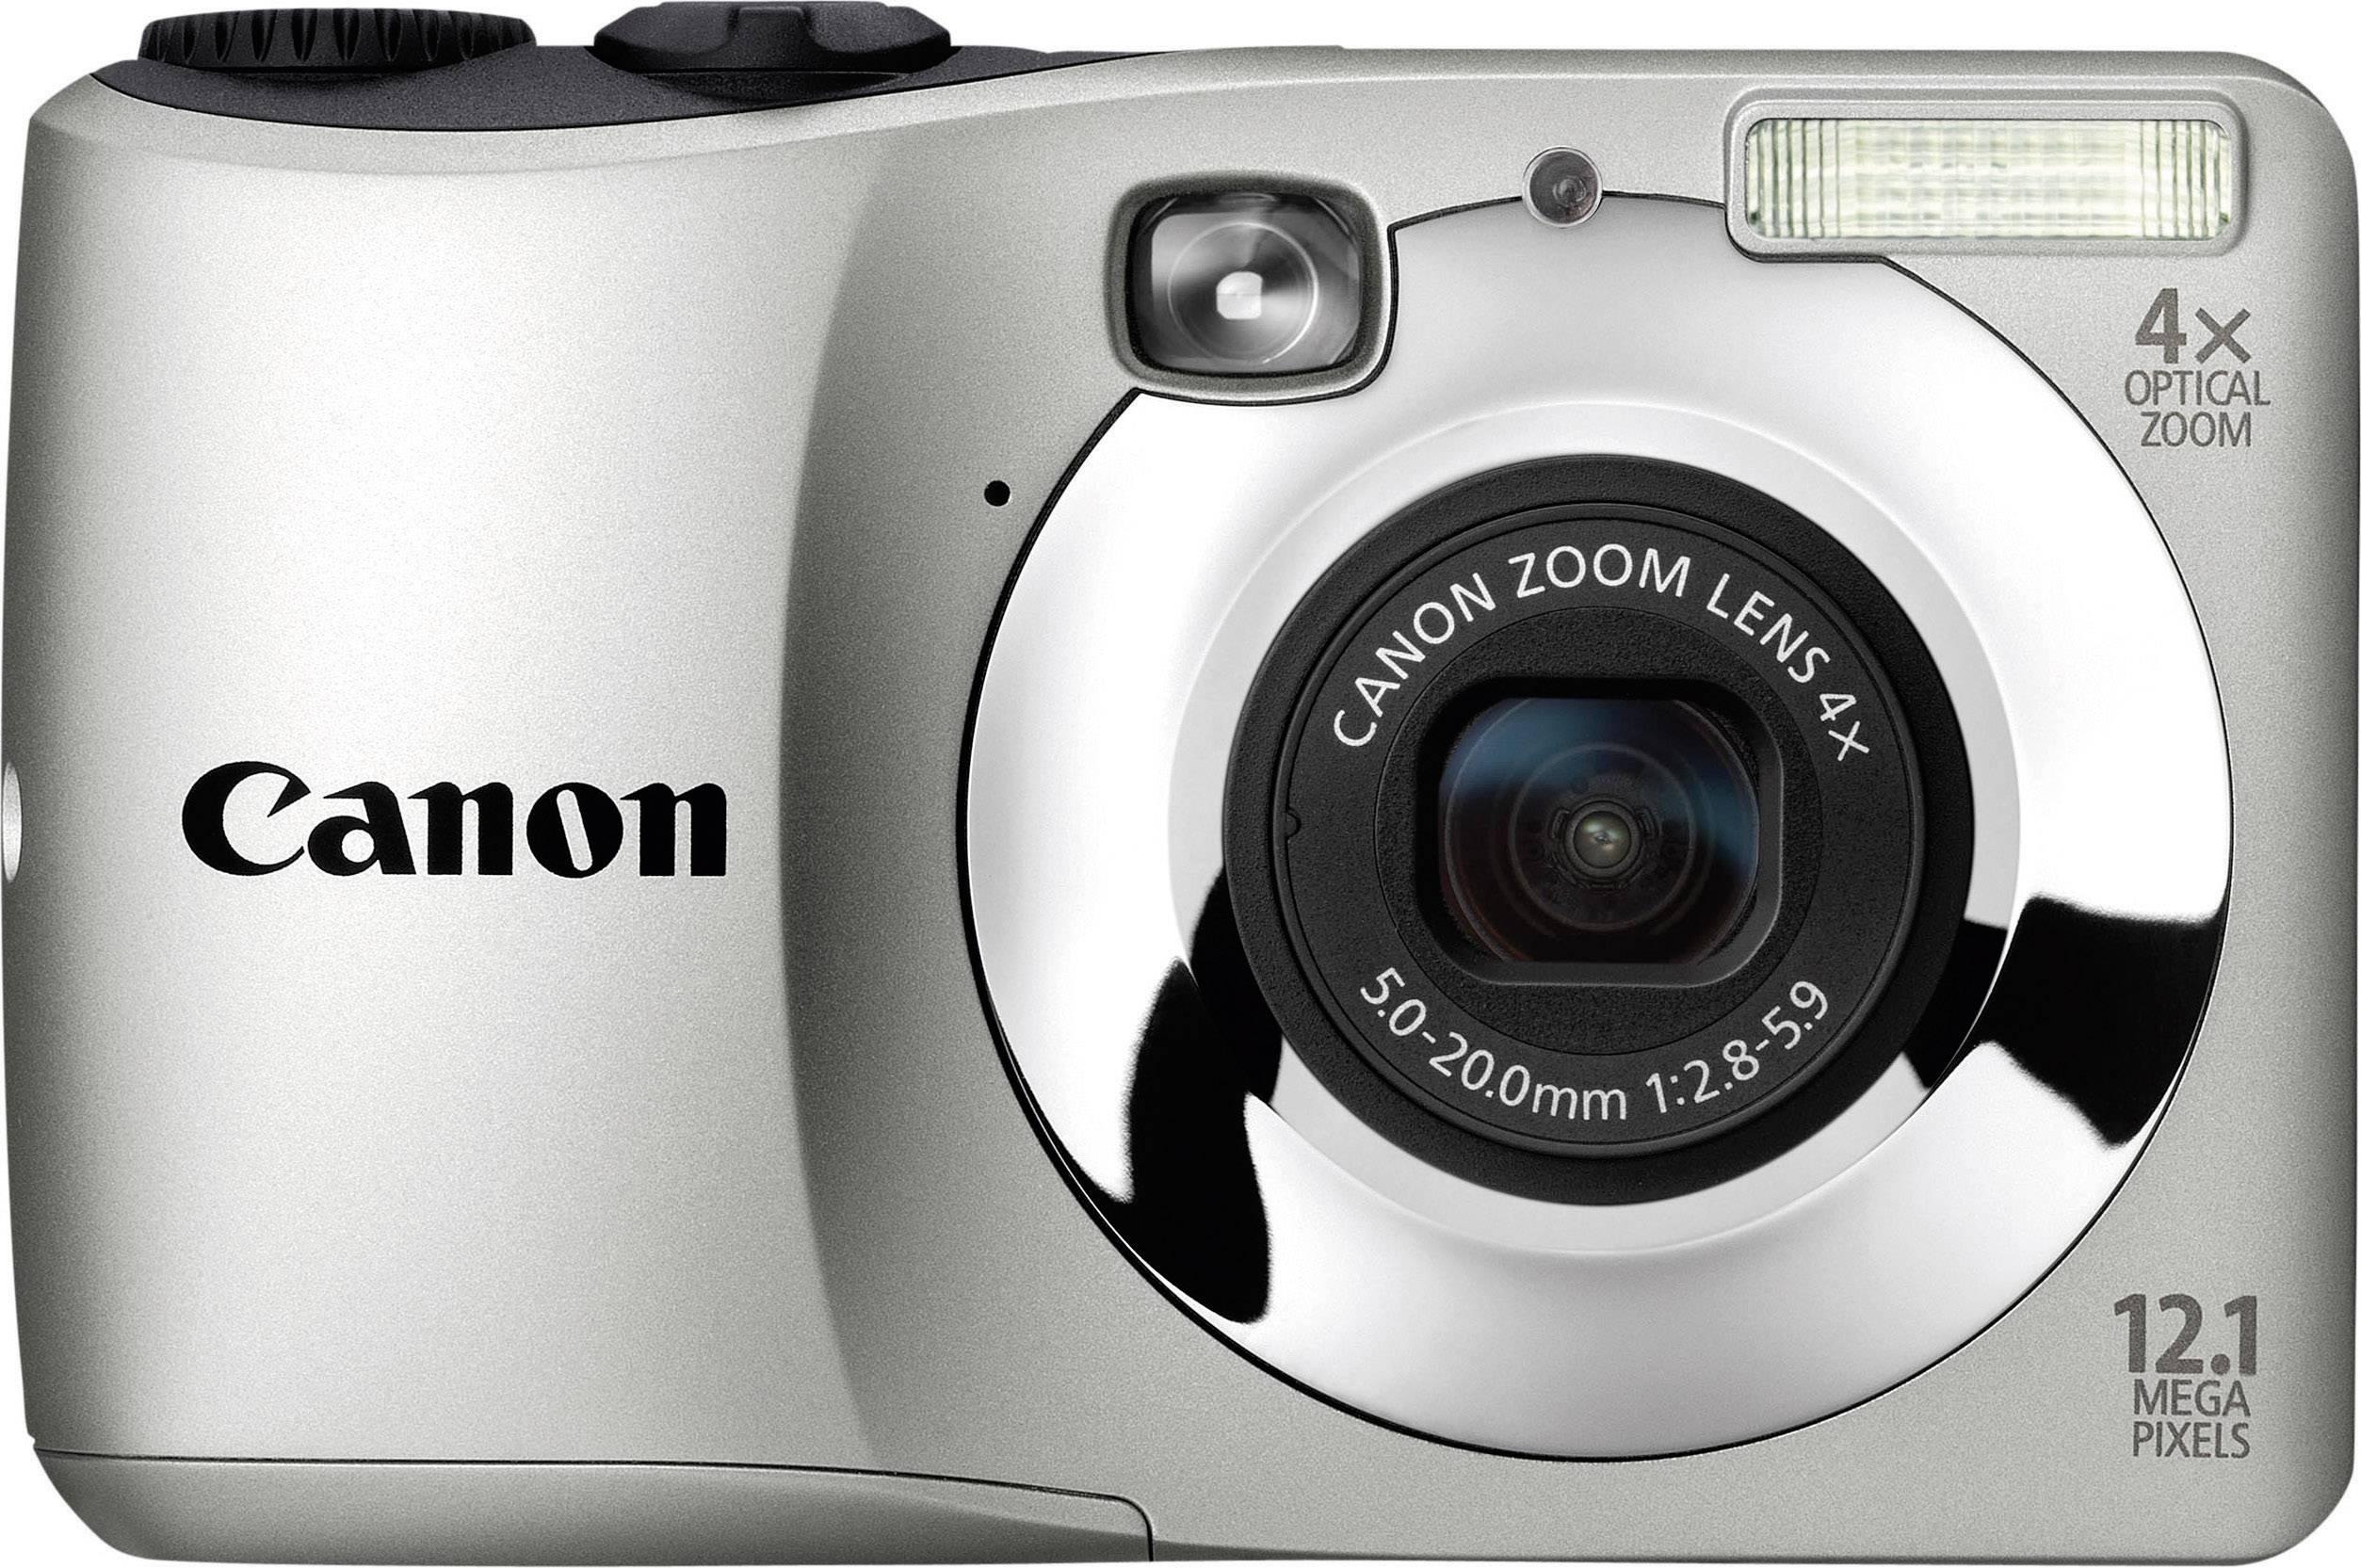 canon powershot a1200 digital camera 12 1 mpix 4 x 6 8 cm 2 7 rh conrad com Canon PowerShot A1200 Software Sony Camera